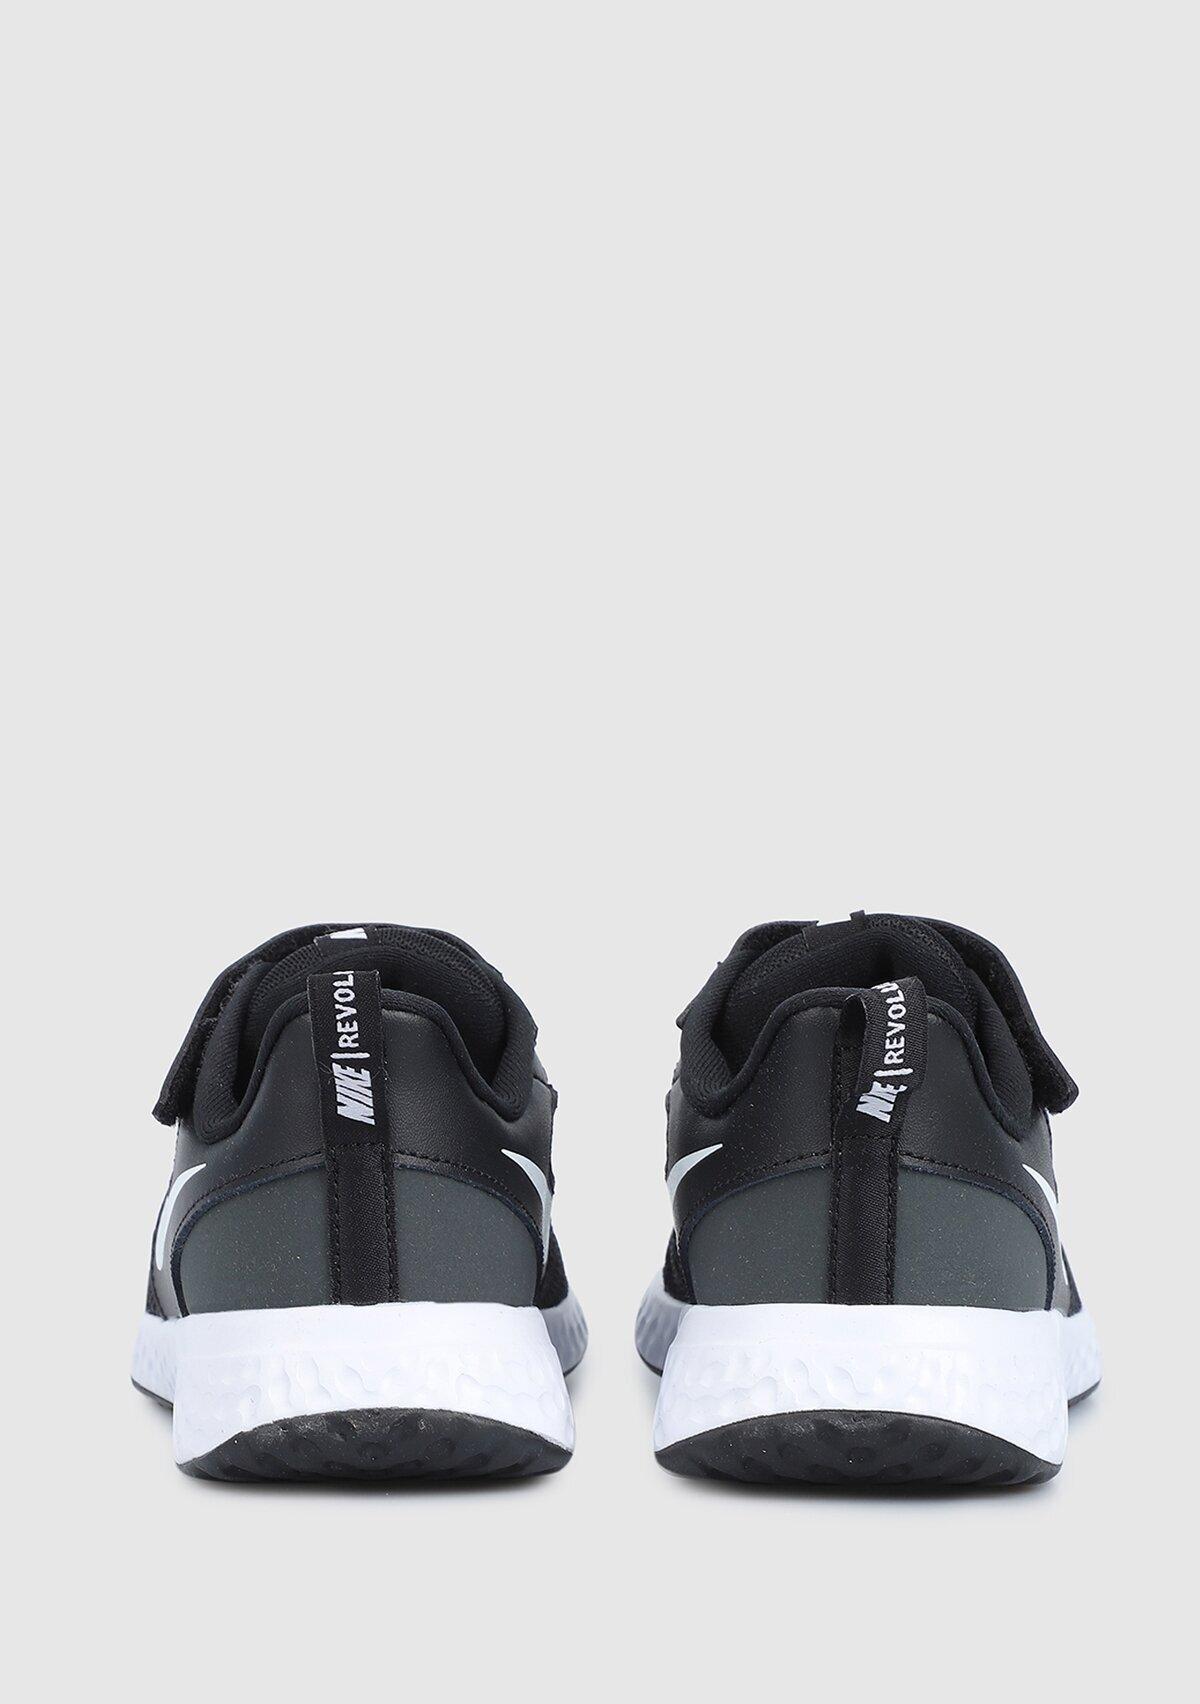 resm Revolution 5 Siyah Unisex Spor Ayakkabısı Bq5672-0